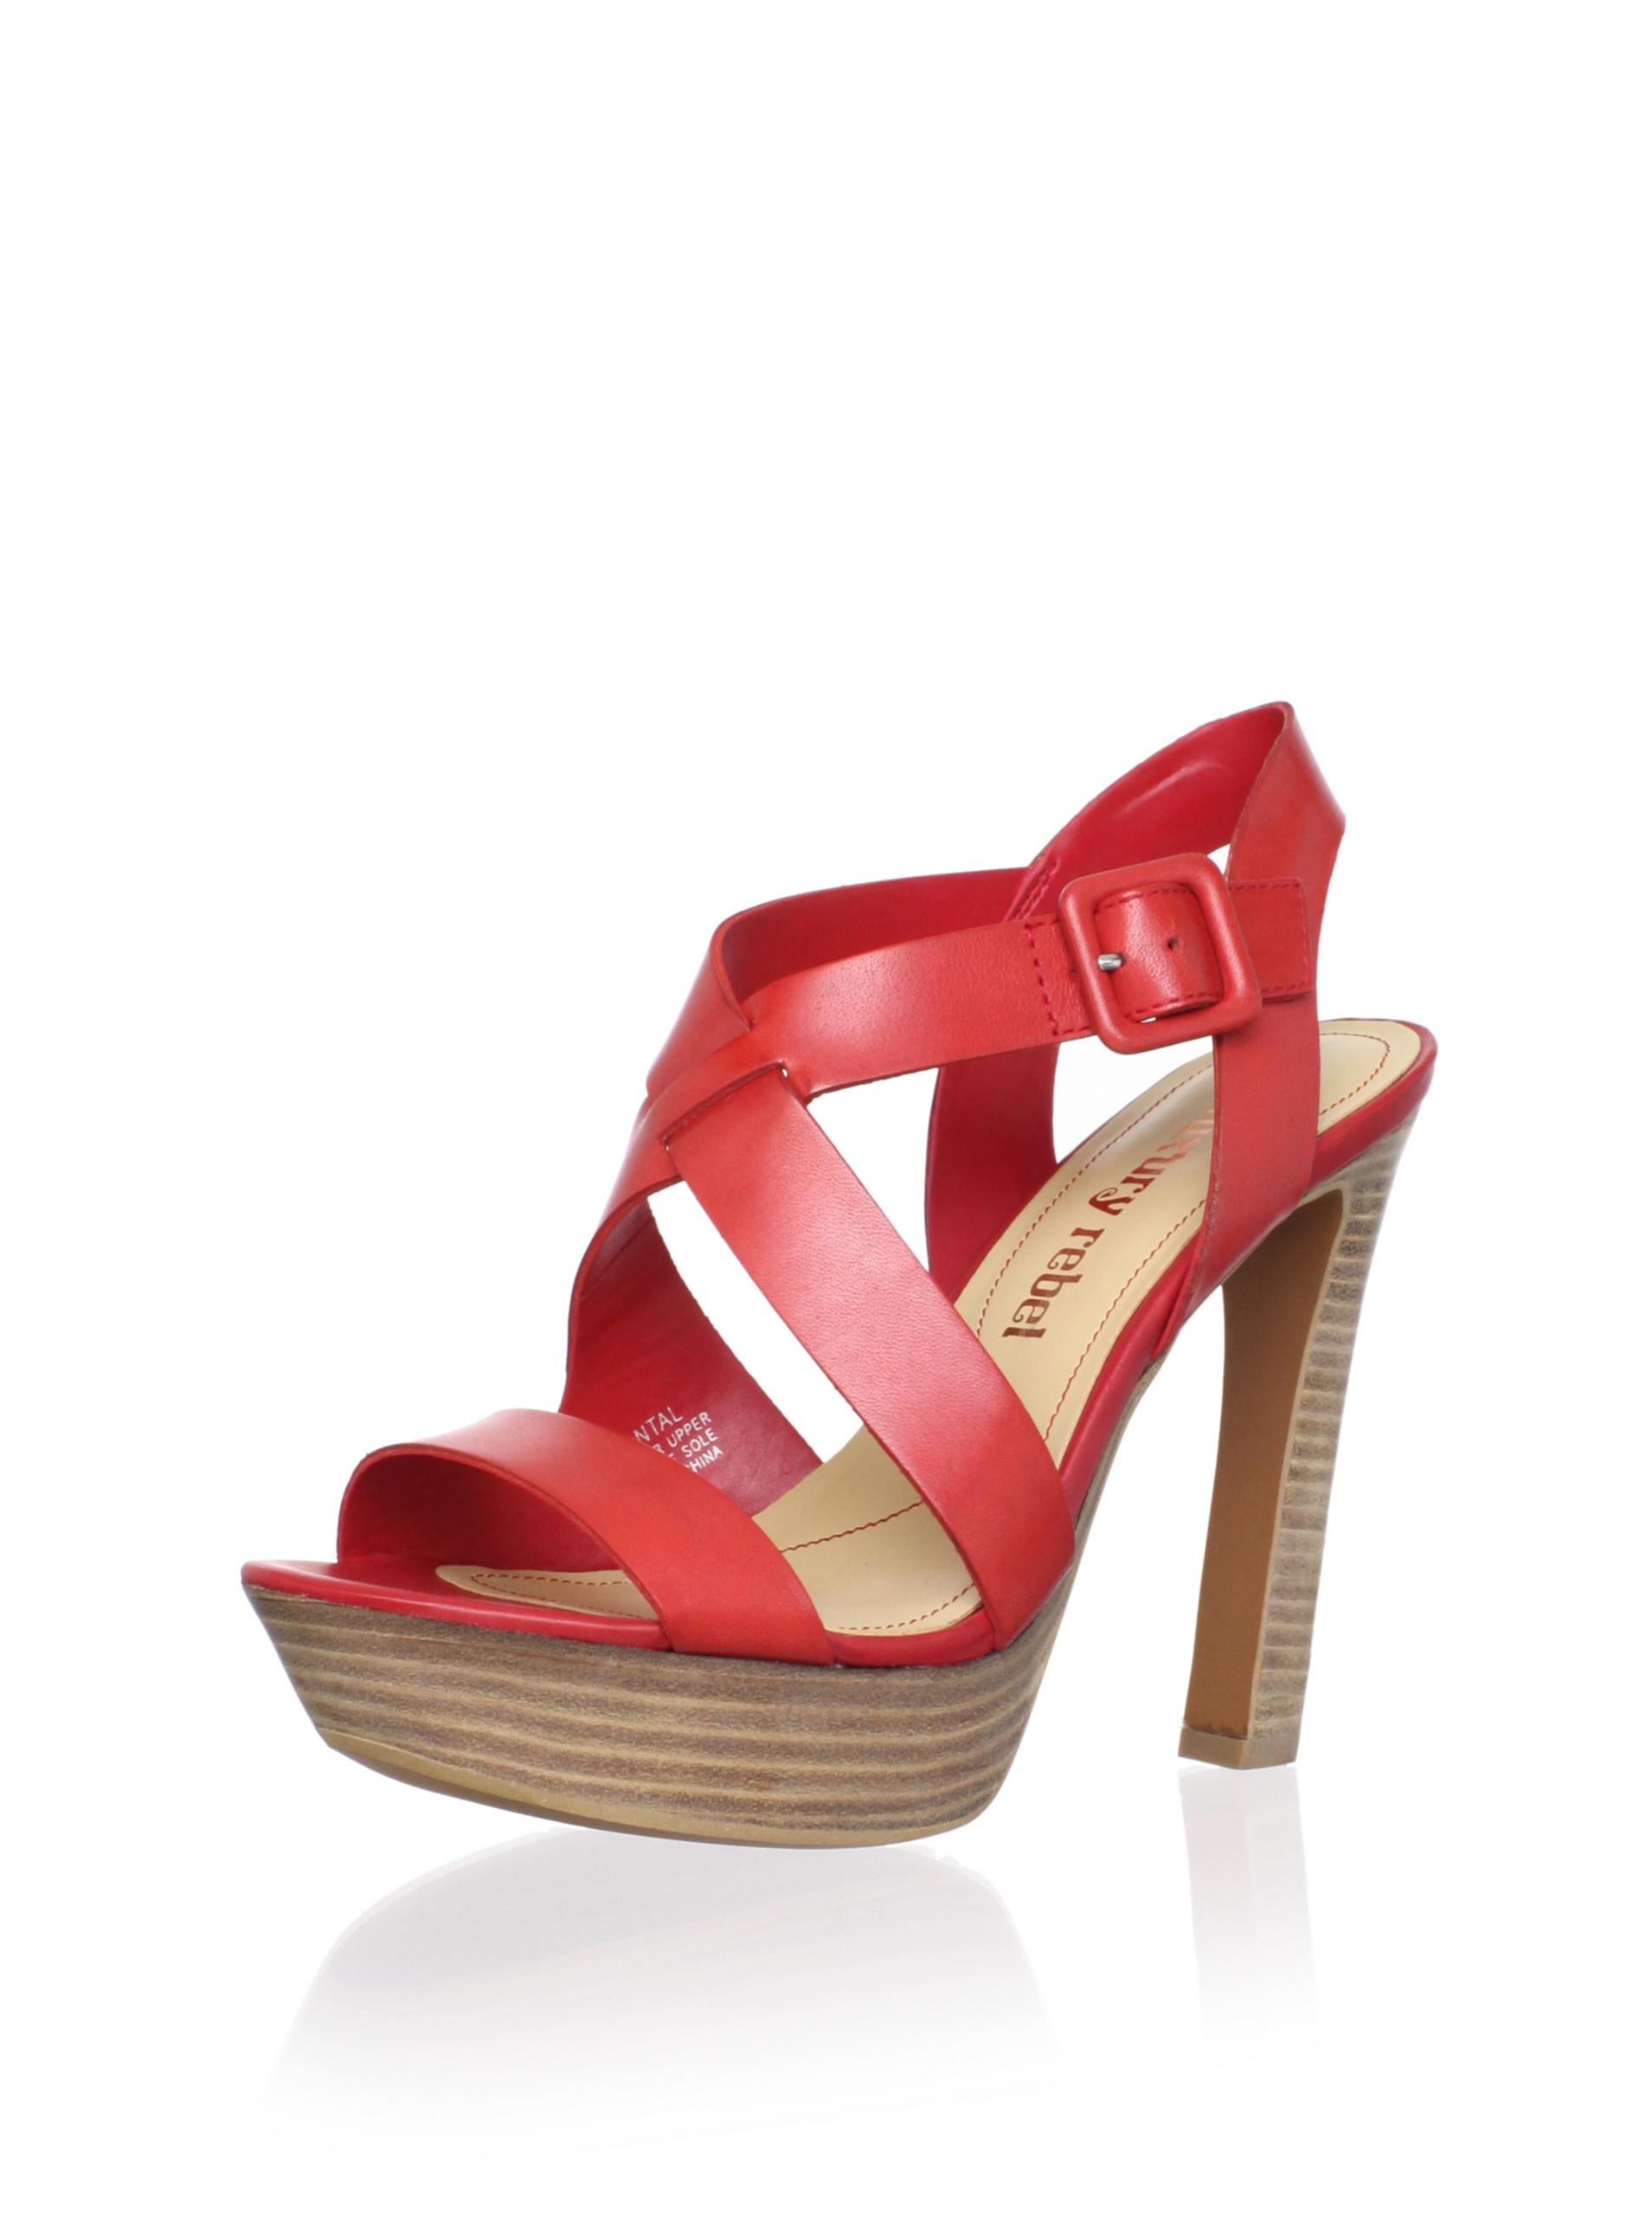 Luxury Rebel Women's Chantal Ankle-Strap Sandal (Coral Red)